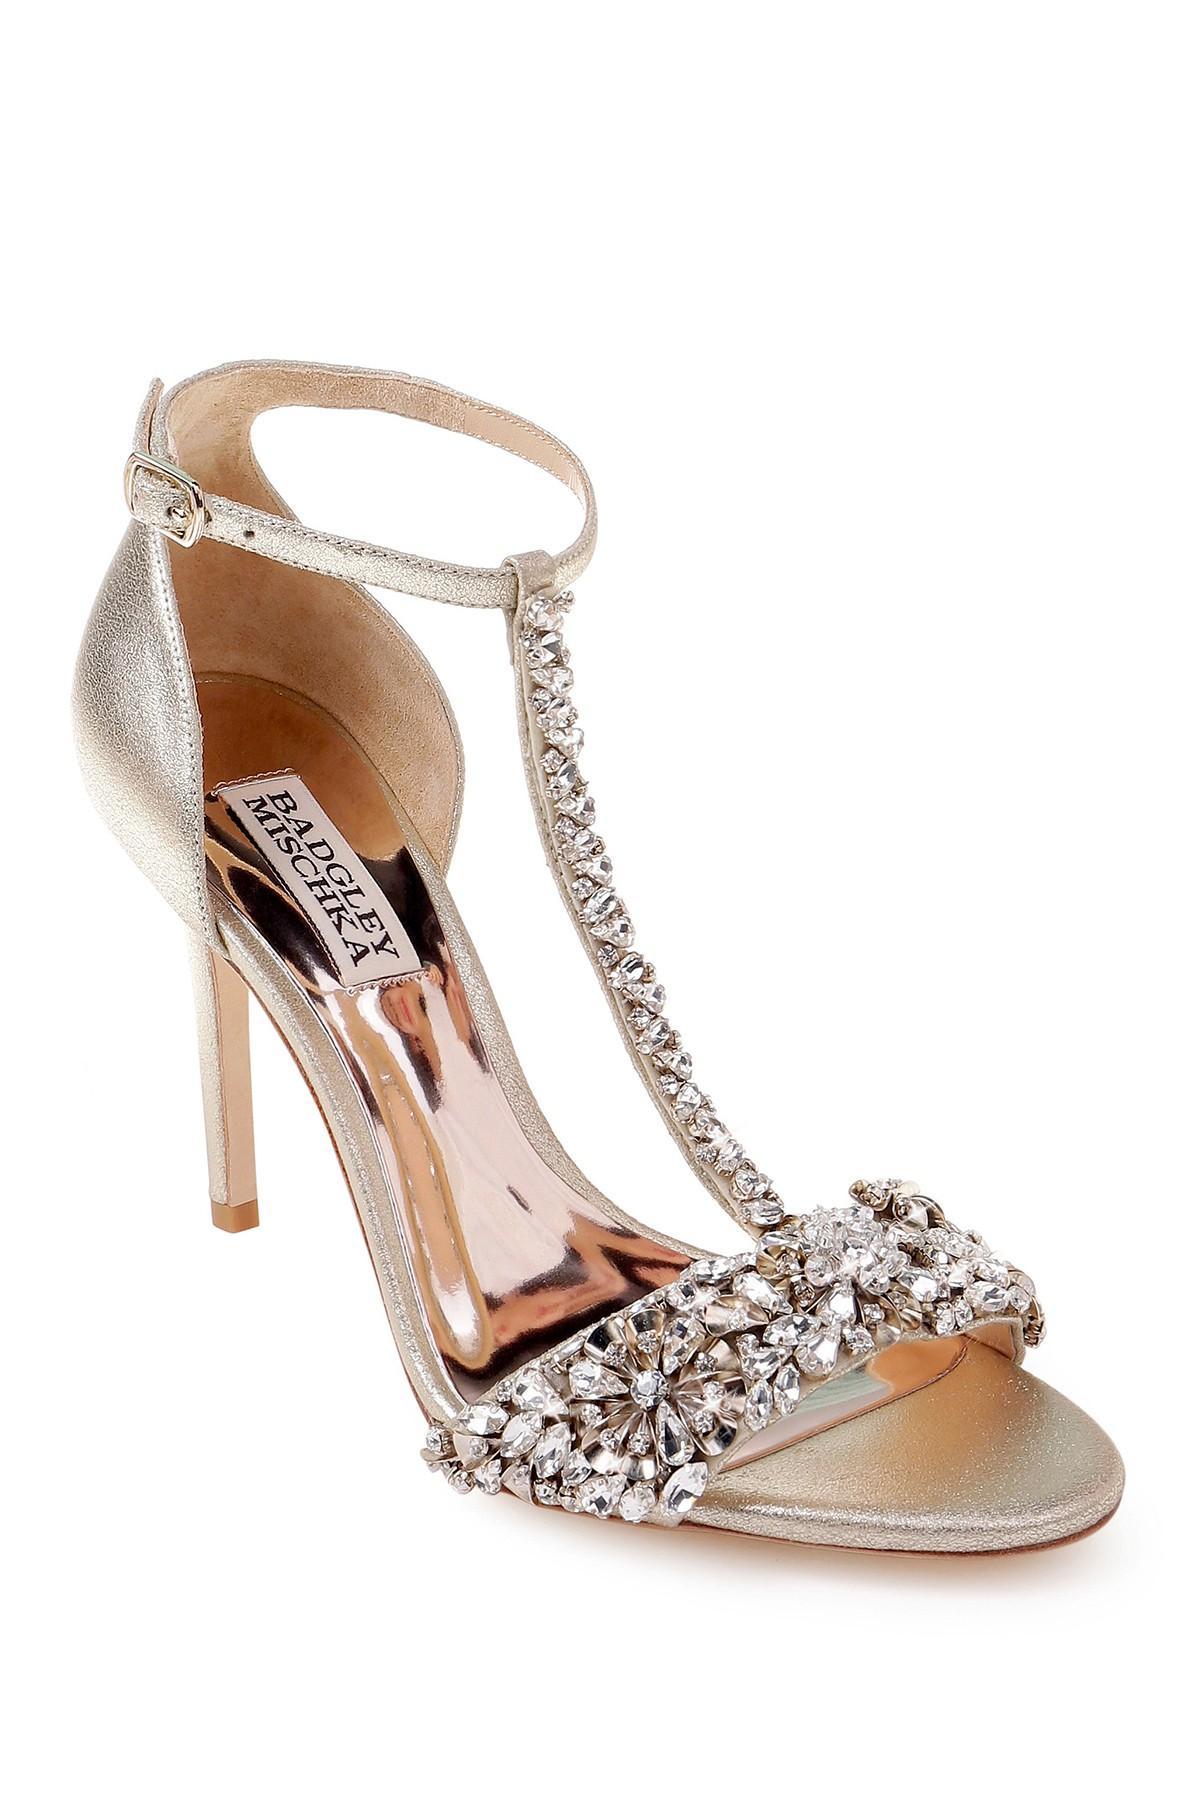 ae9a07a160d Badgley Mischka - Multicolor Crystal Embellished Sandal (women) - Lyst.  View fullscreen